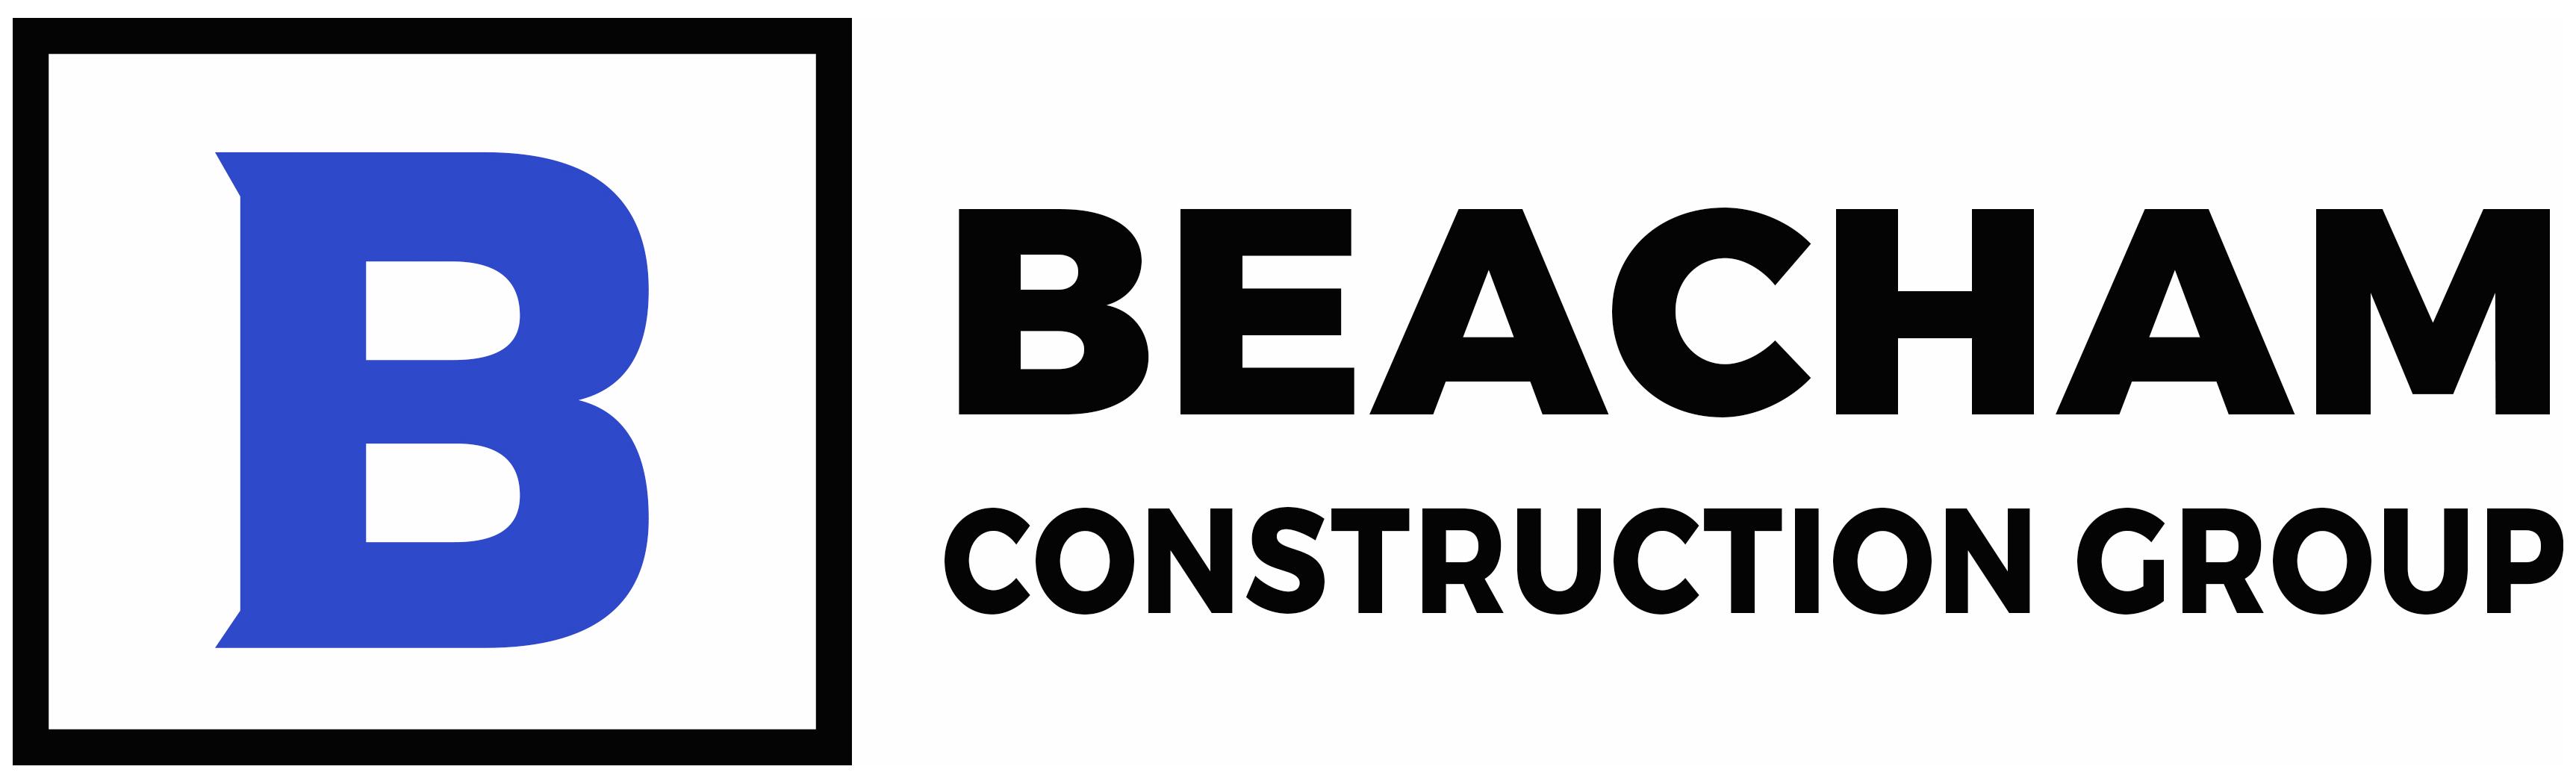 Beacham Construction Group (NC) Logo